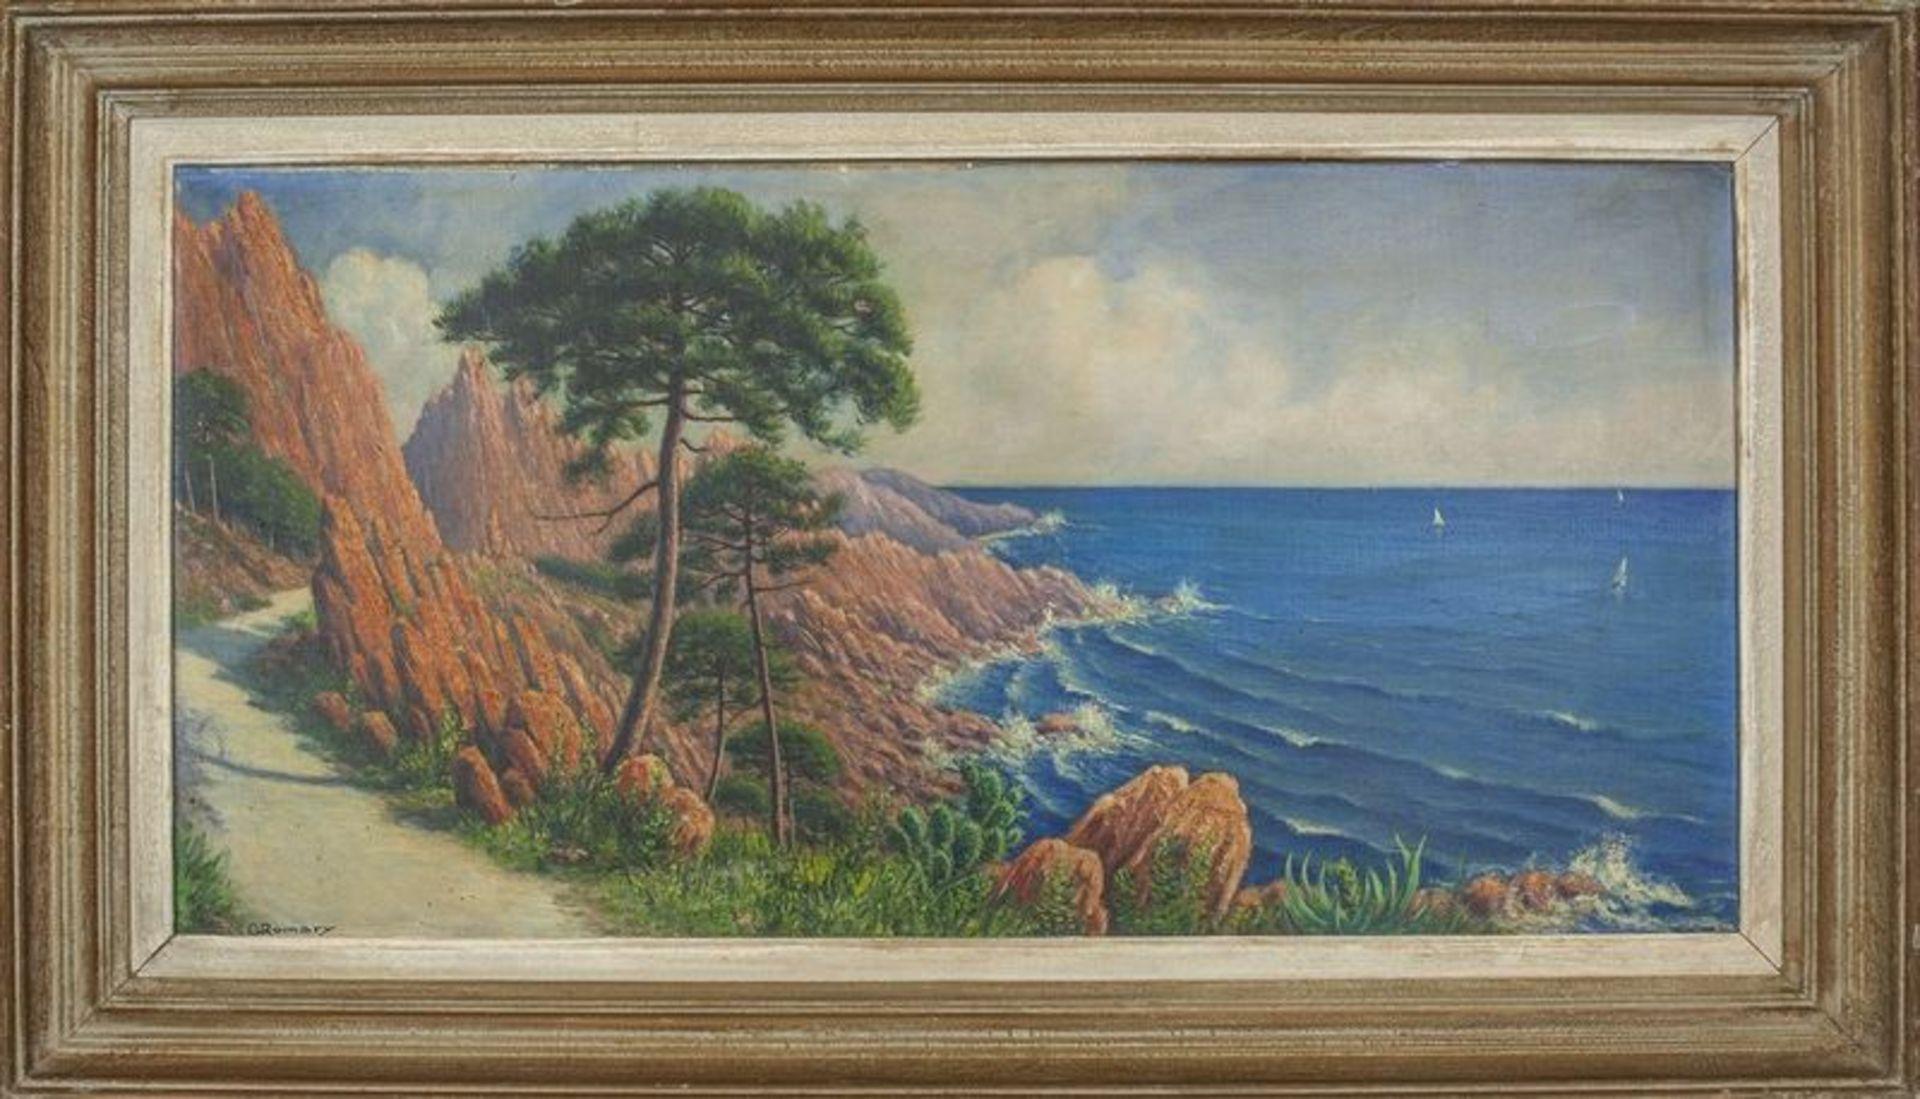 G. ROMARY Red Rocks of Cote d'Azur - Signed 'G Romary' (lower left) Oil on [...]